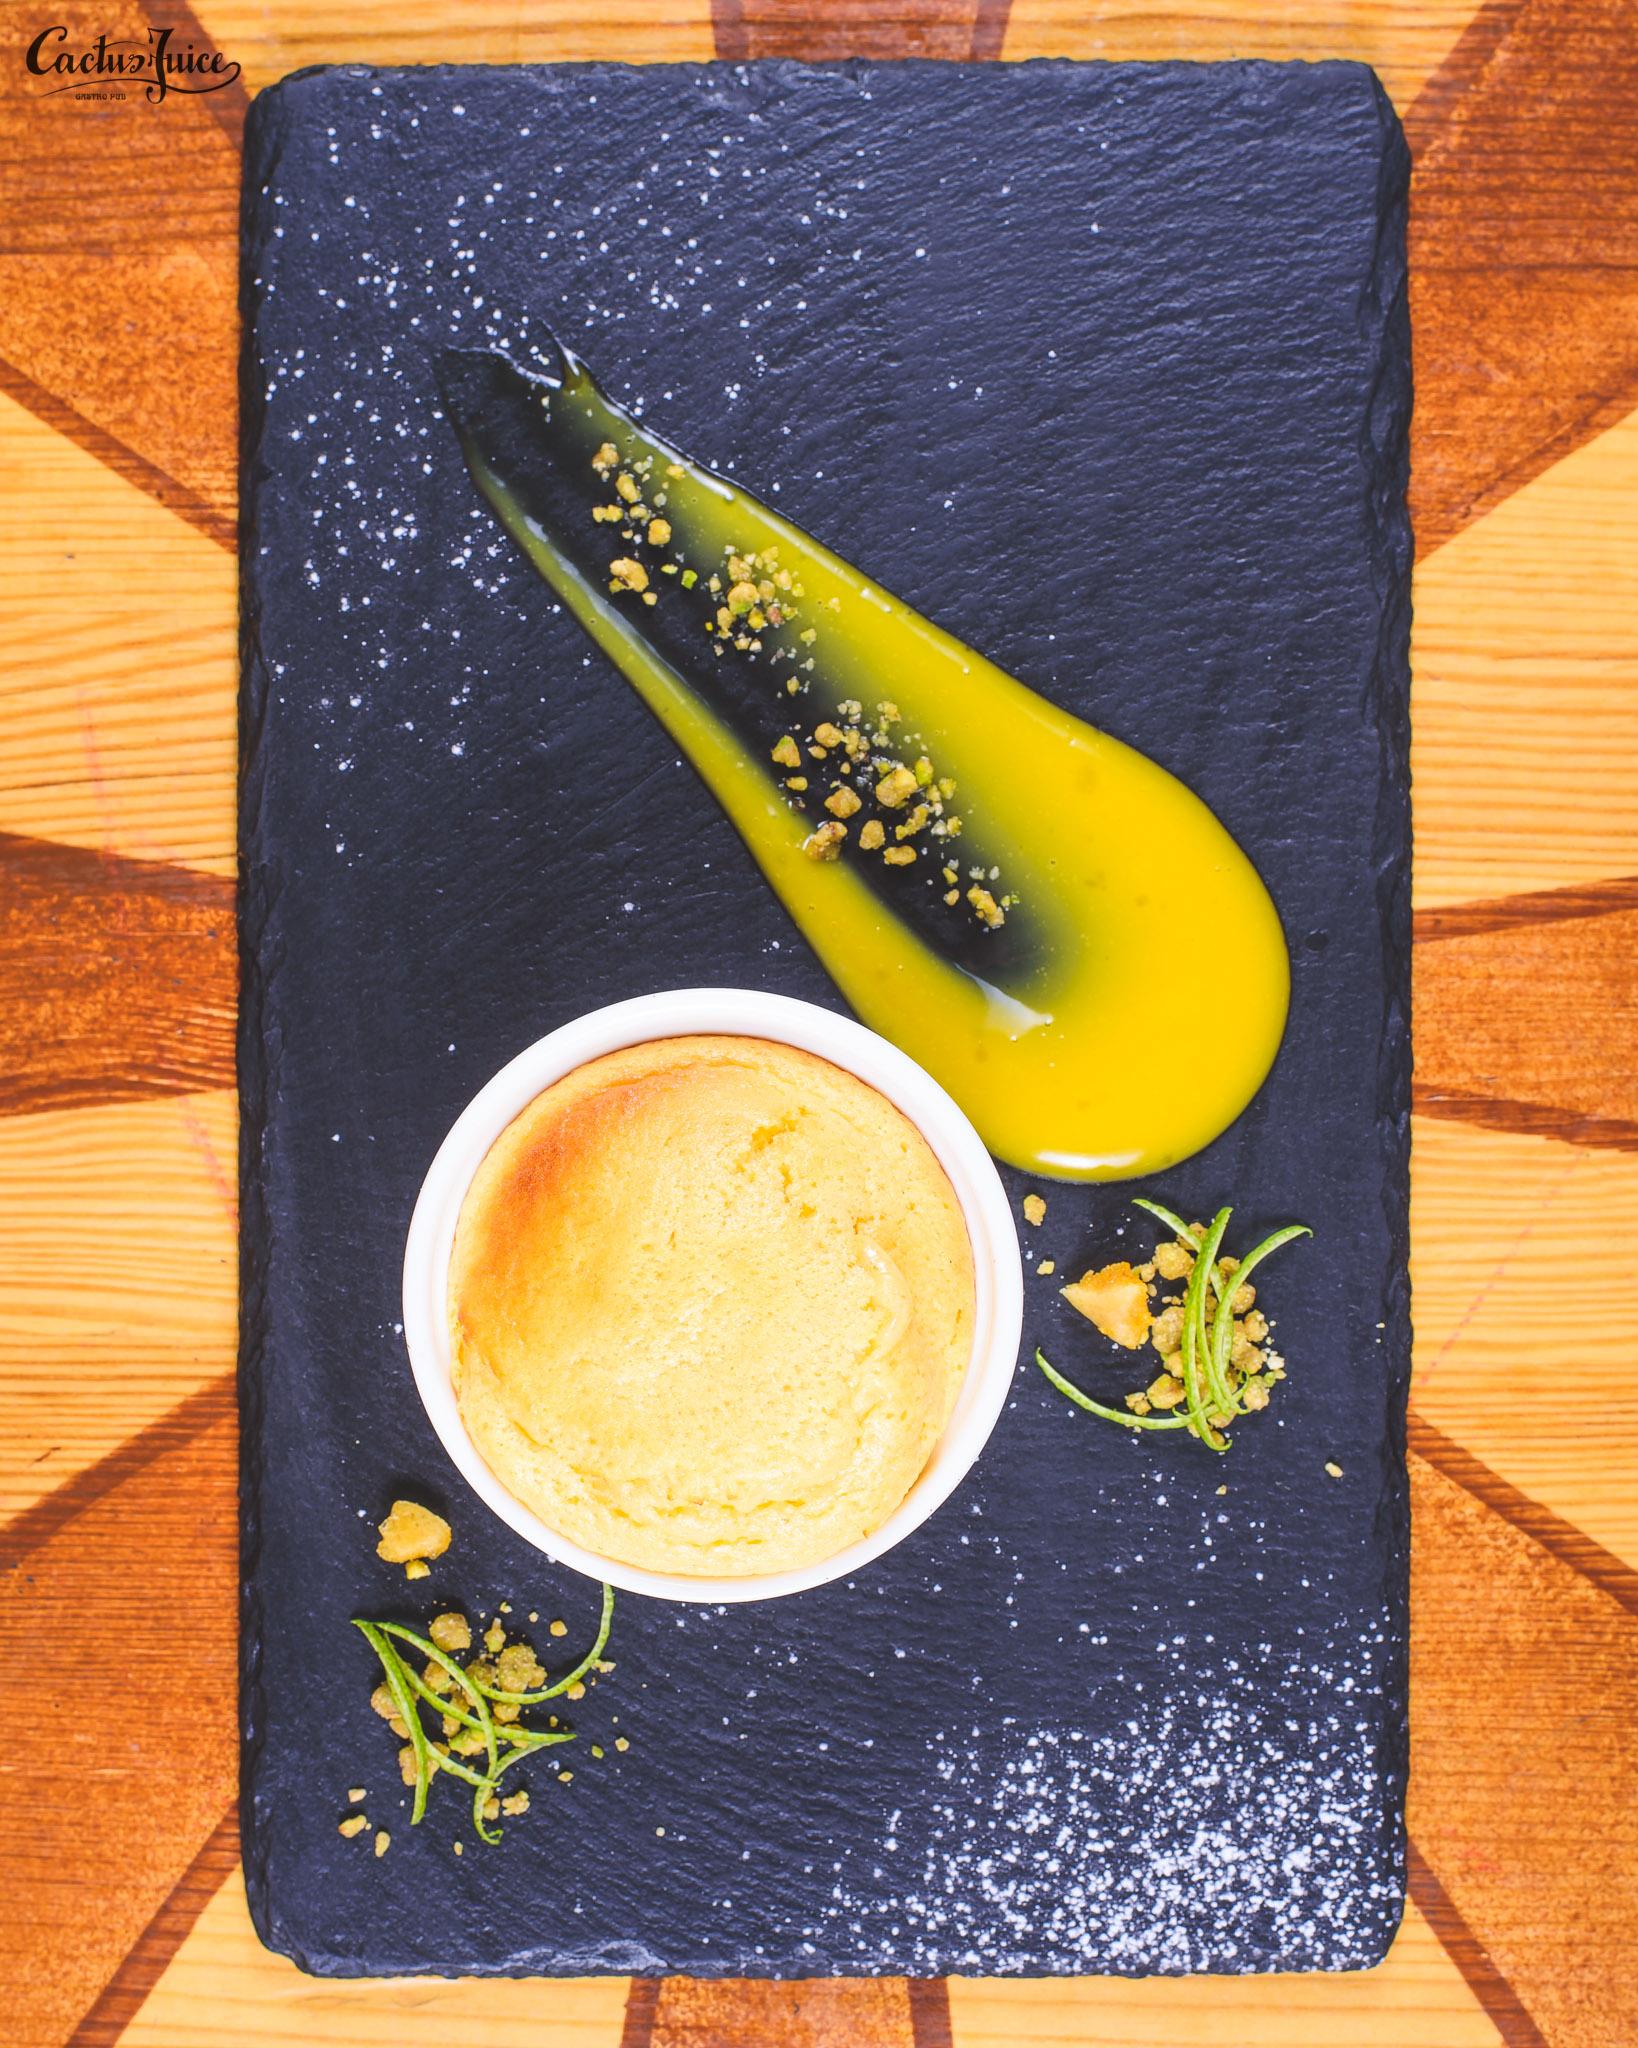 Mangó souflee